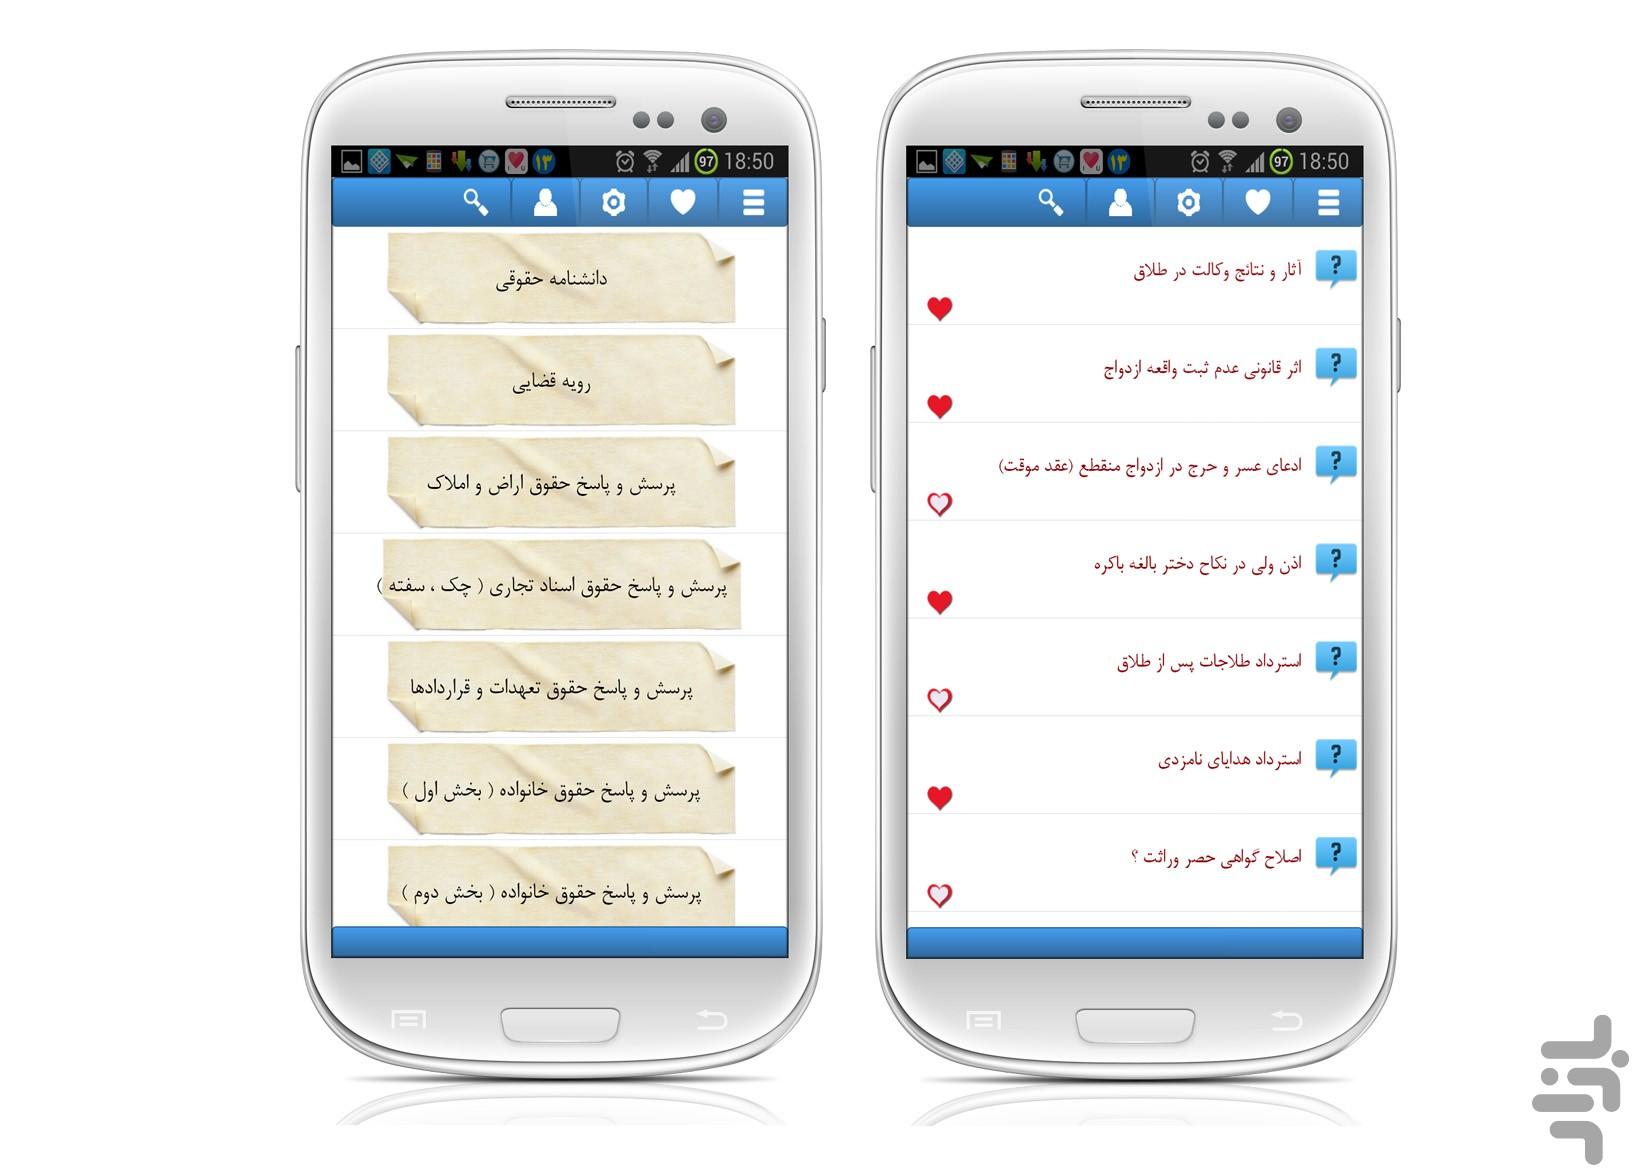 http://s.cafebazaar.ir/1/upload/screenshot/ir.Ghazi.parsababaei1.jpg